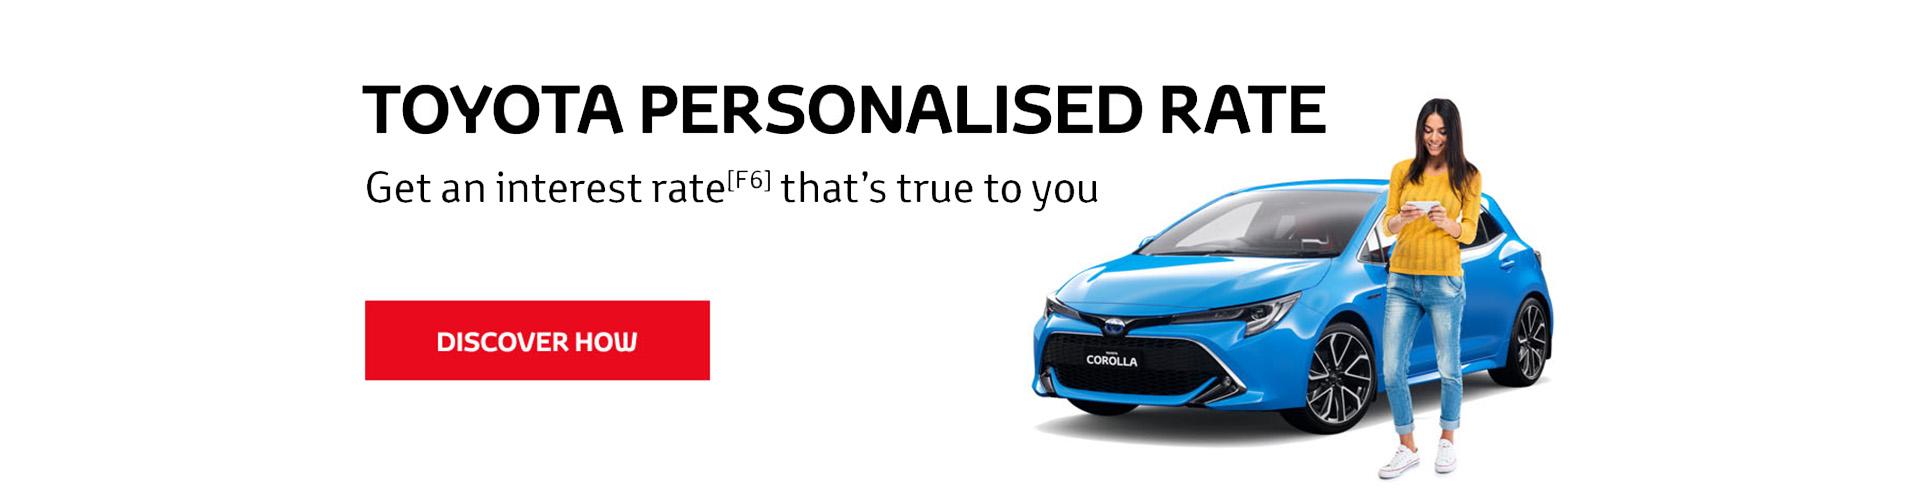 Toyota Personalised Rates